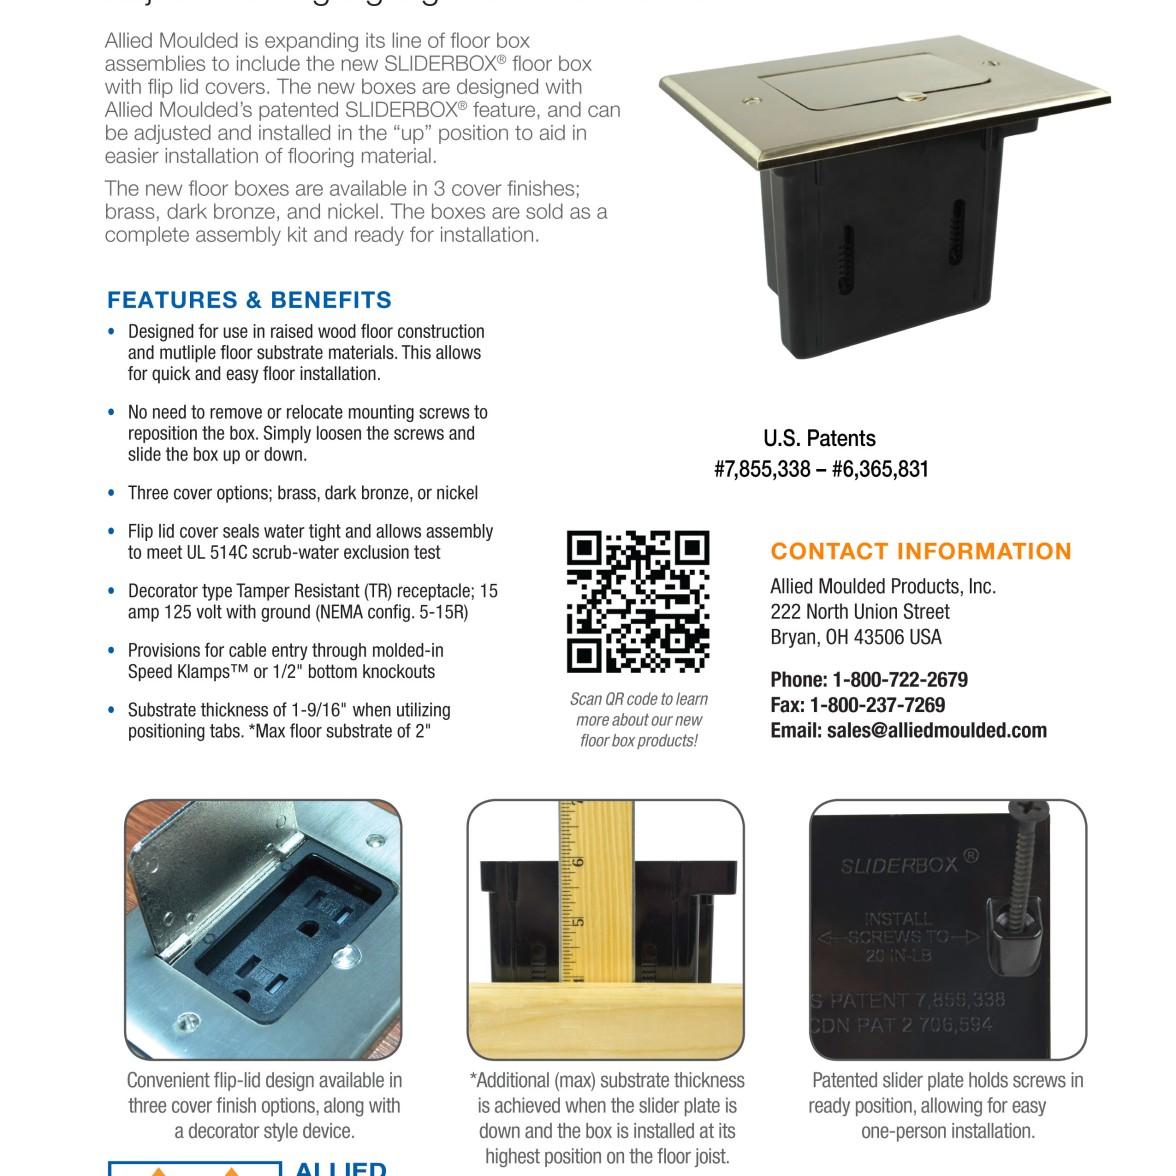 sliderbox_floor_box_bulletin_2016-1